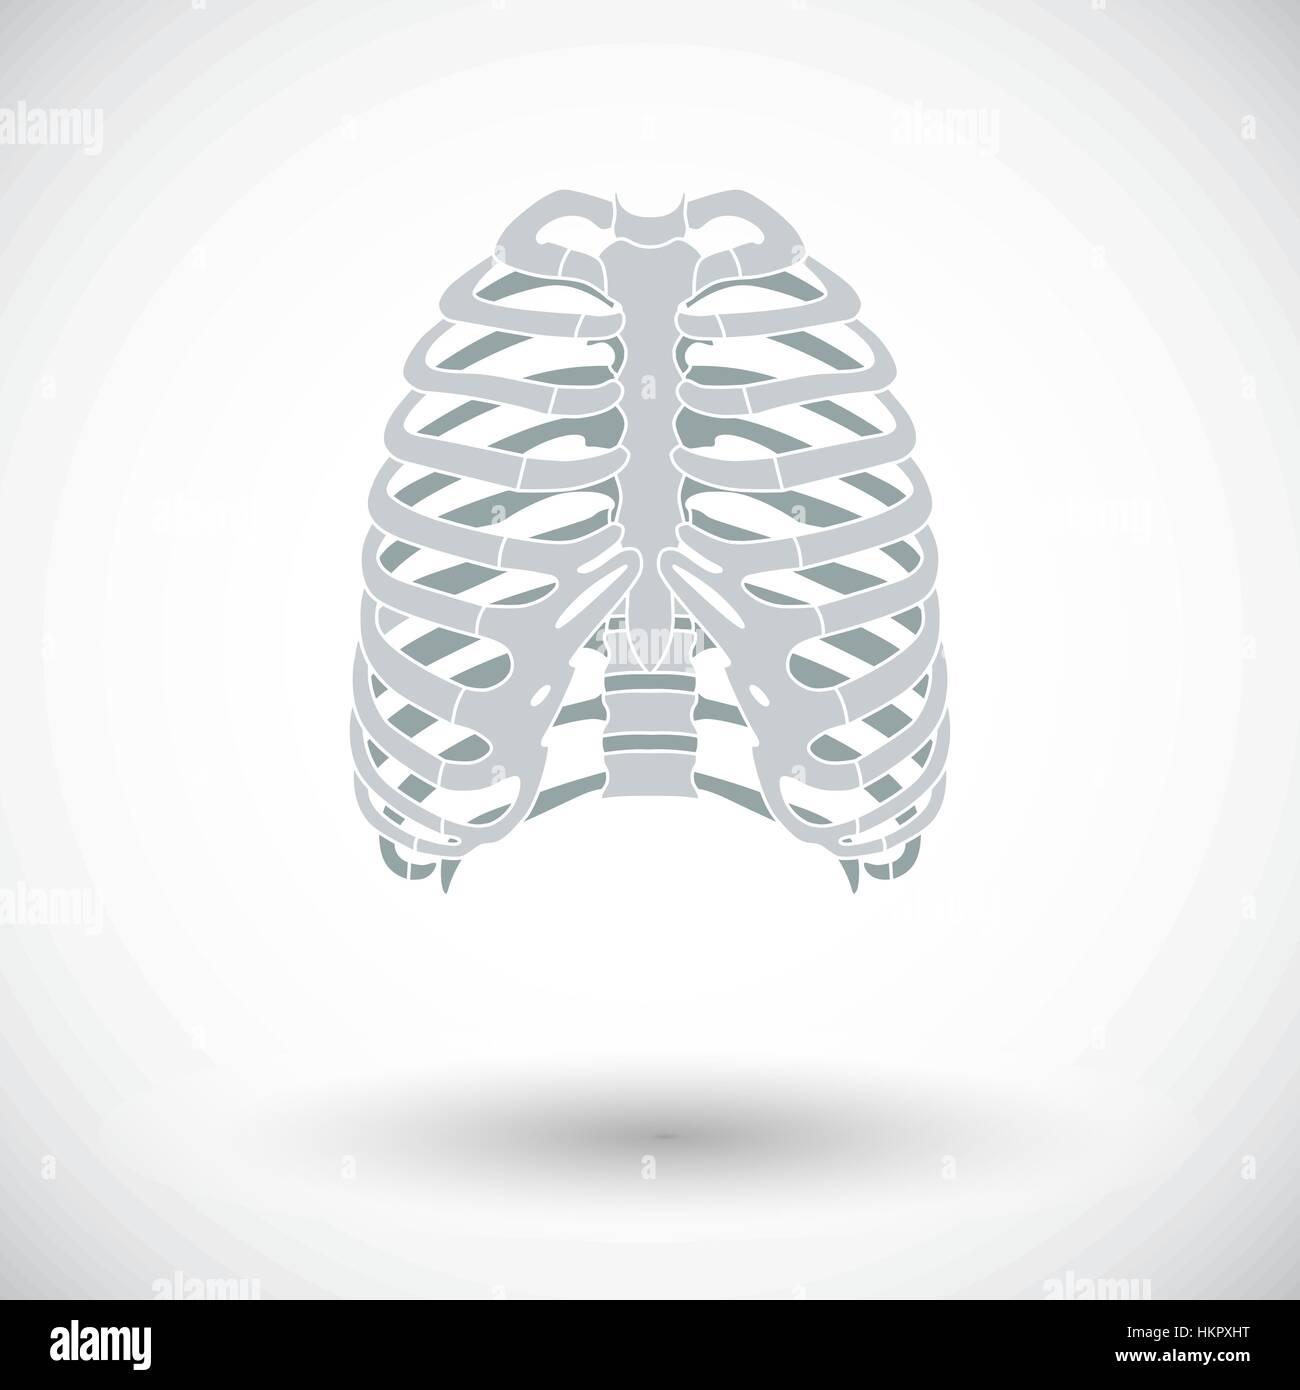 Body Sternum Stockfotos & Body Sternum Bilder - Seite 2 - Alamy